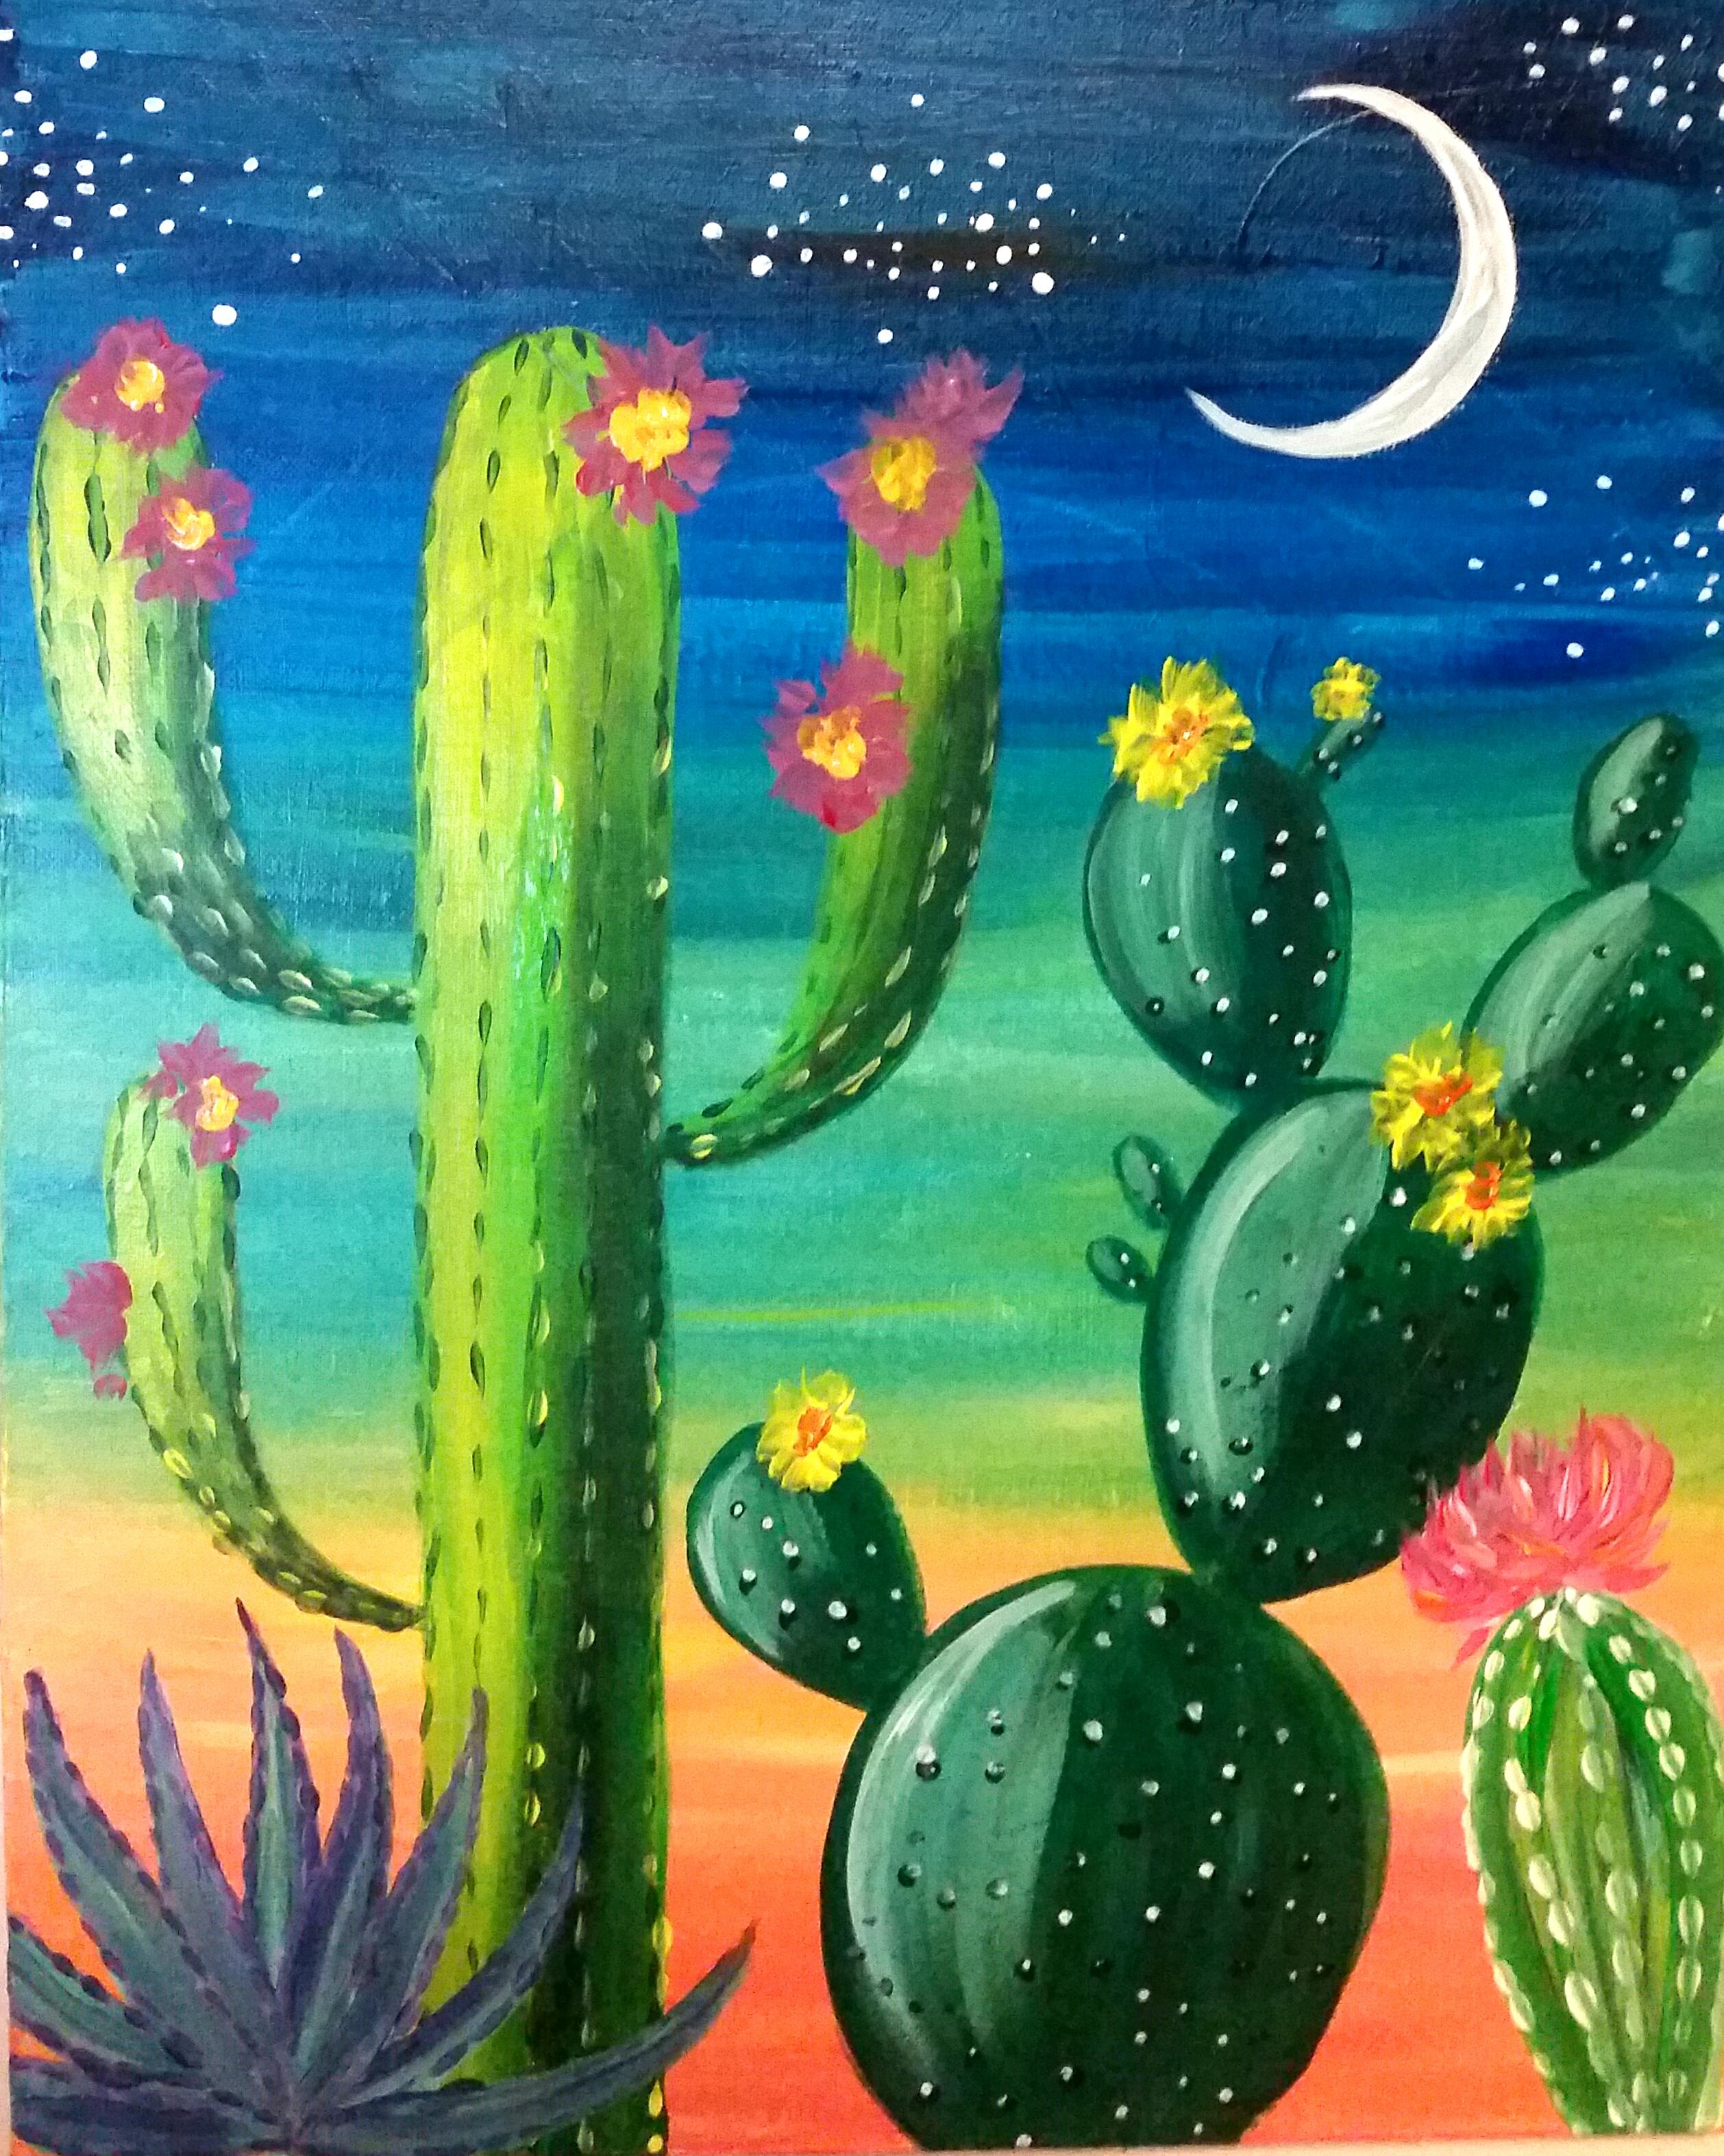 cactus painting wwwpixsharkcom images galleries with